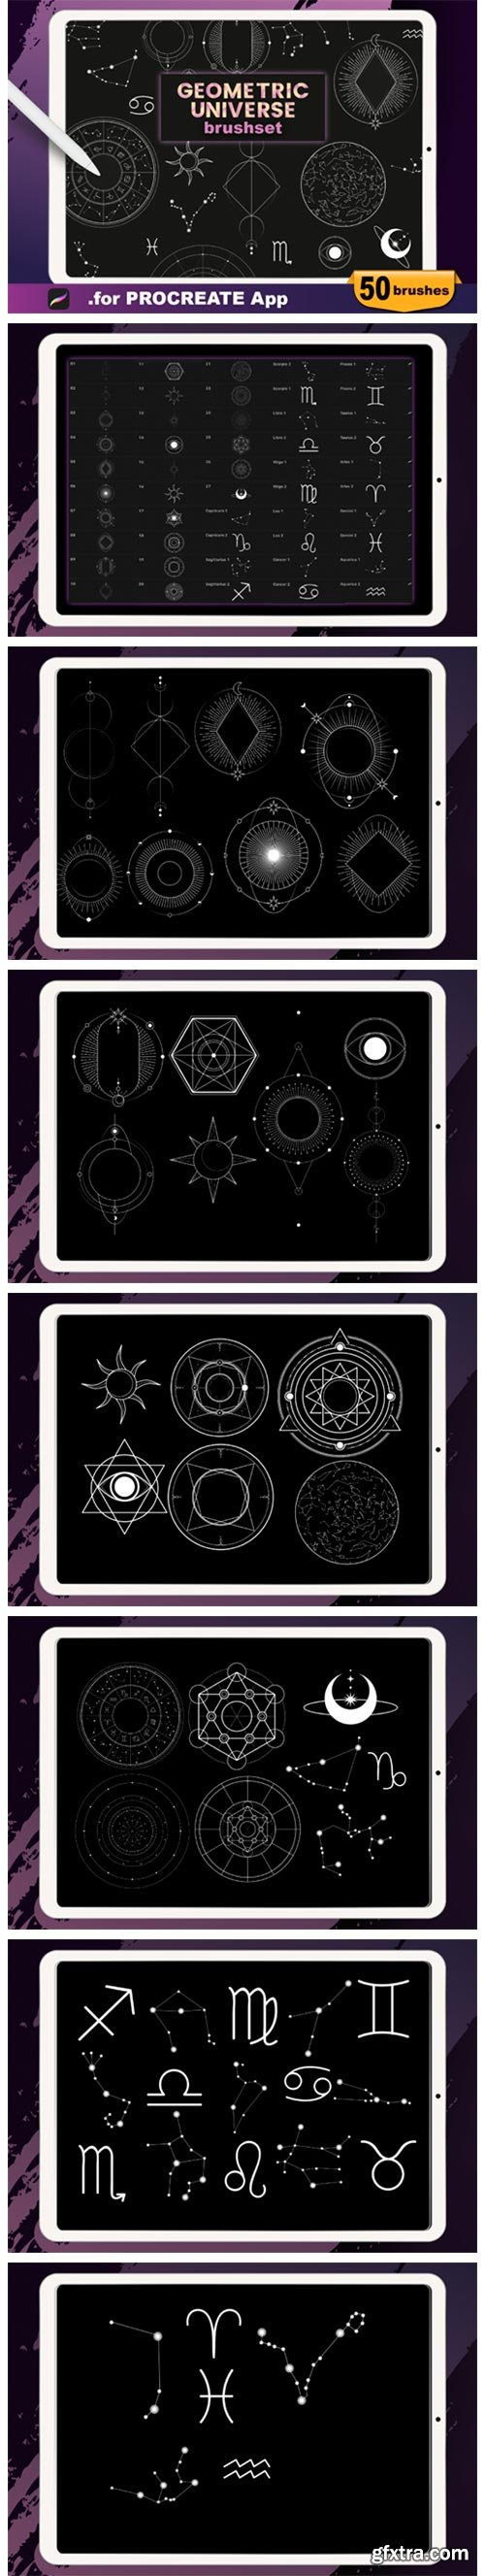 Procreate - Geometric Universe Stamps 4697873